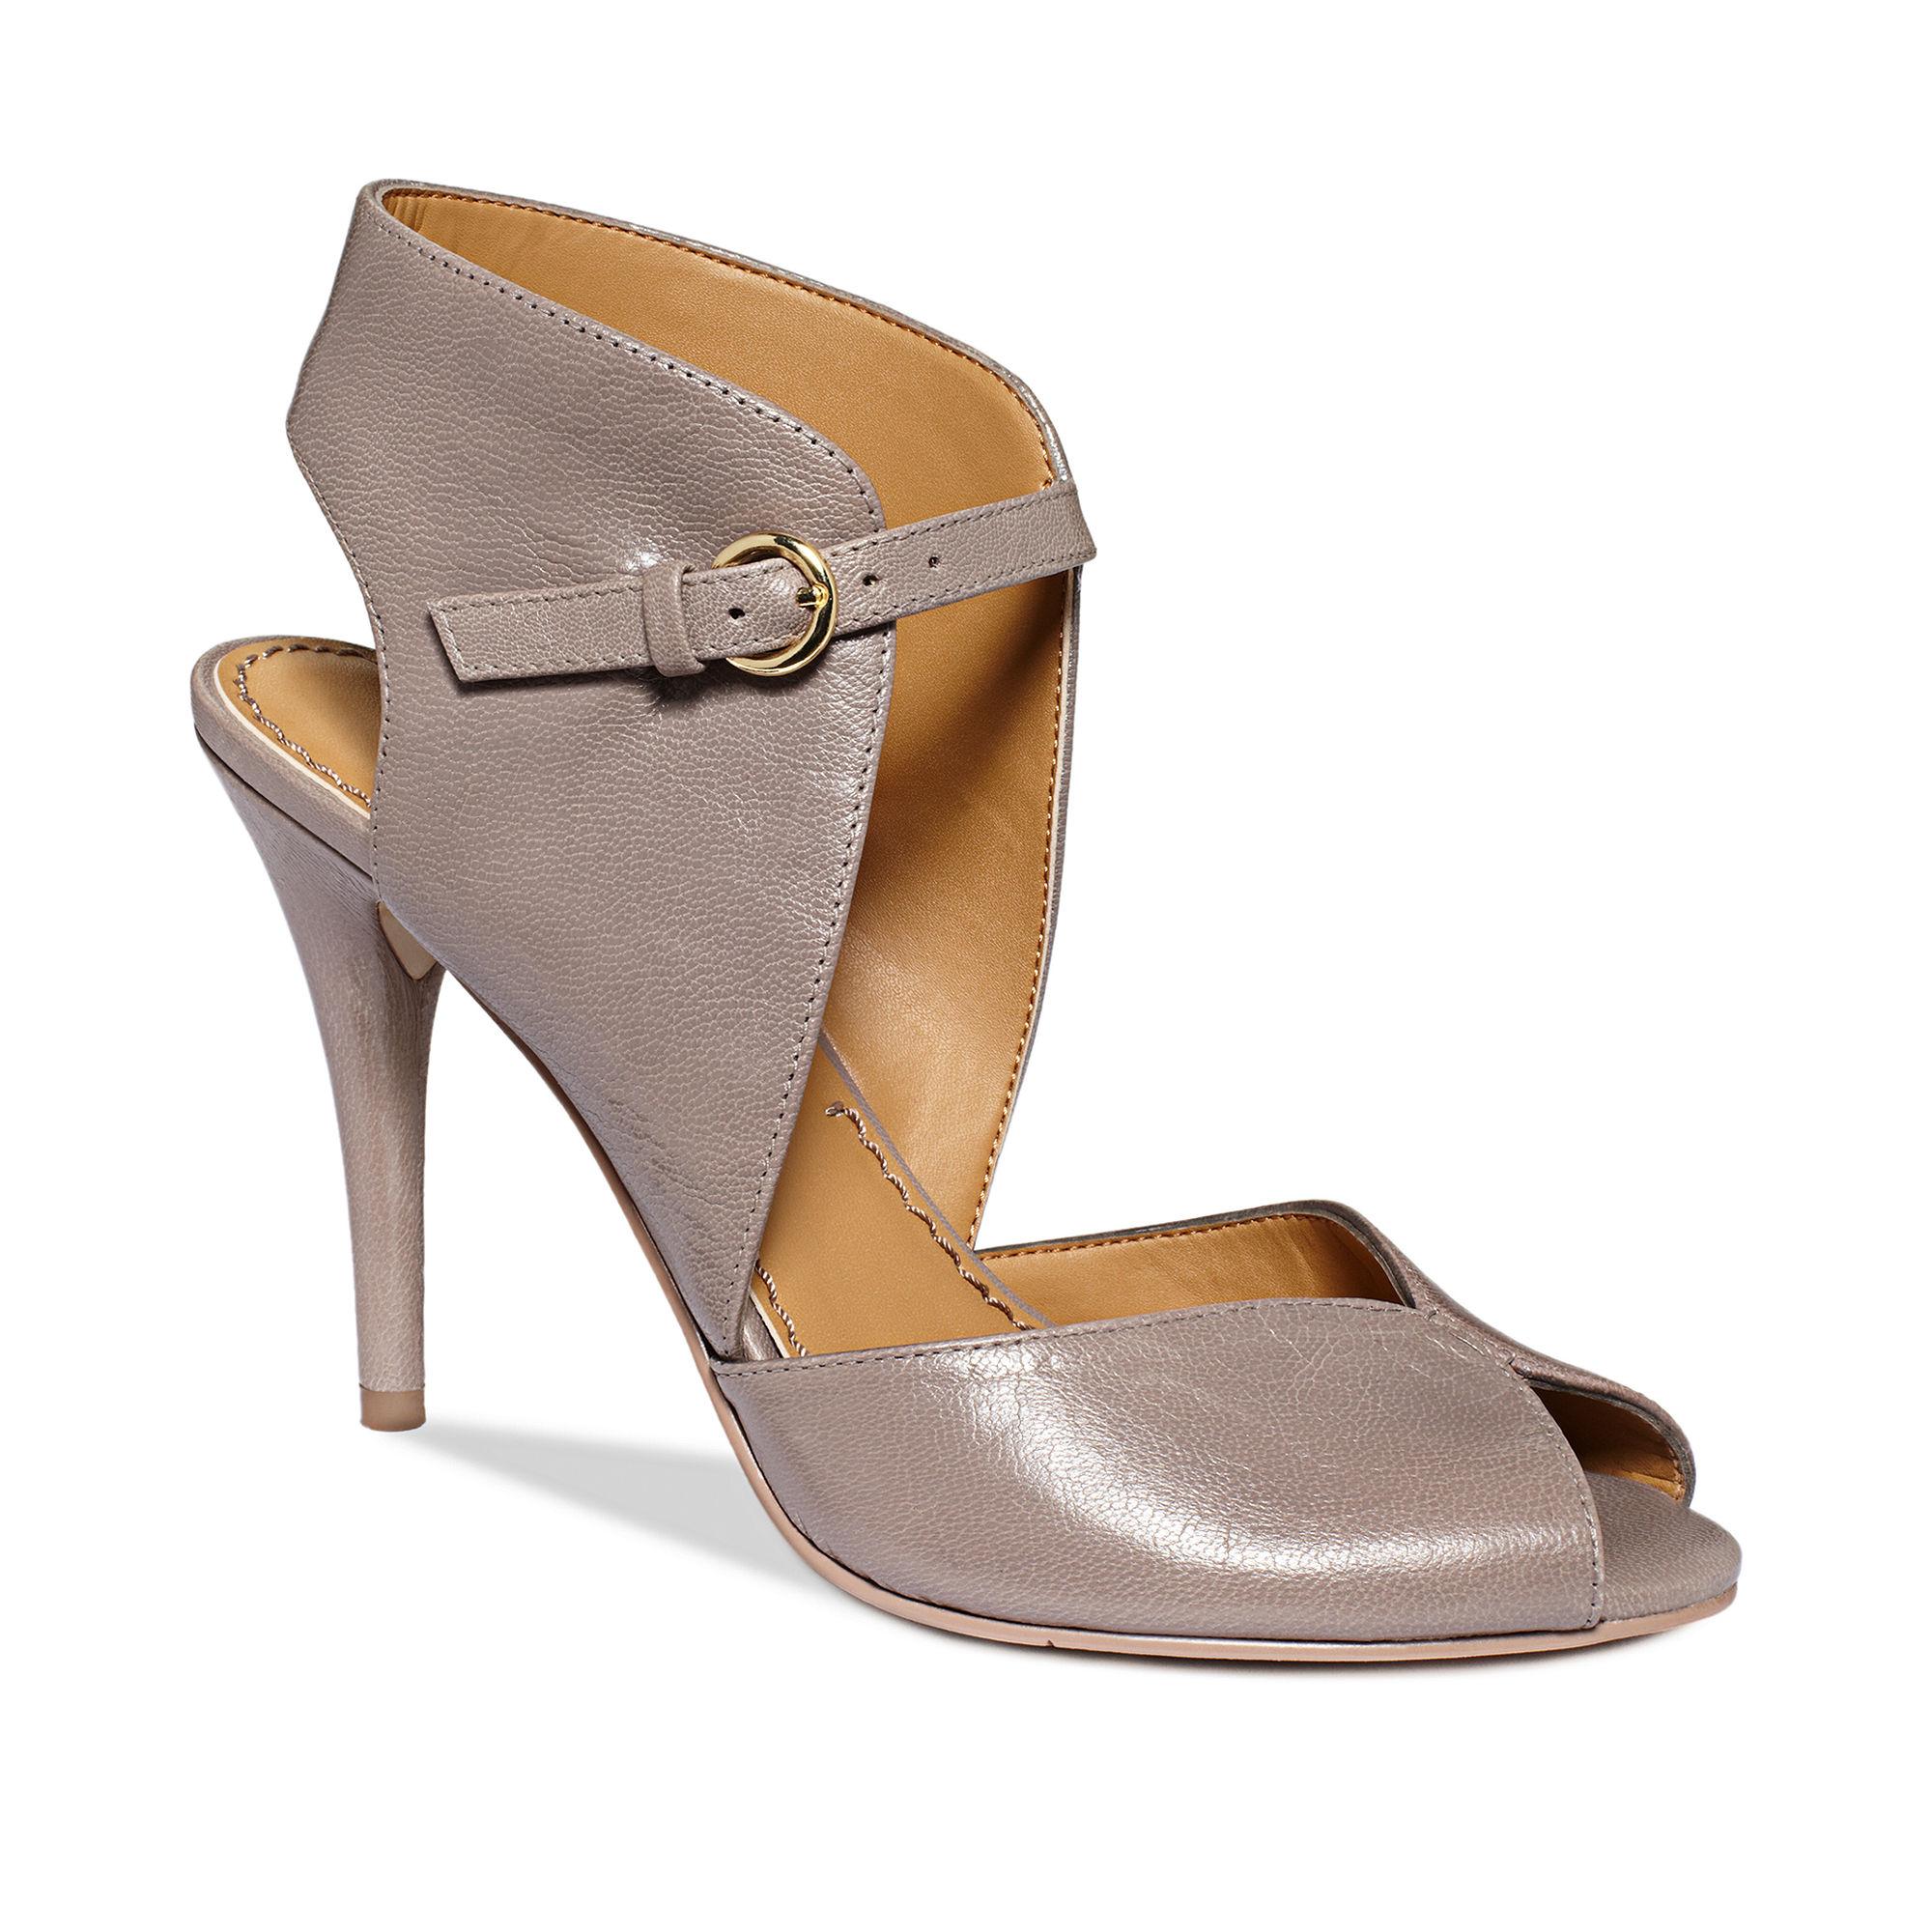 696d229fda3 Nine West Gray Savvy Ankle Strap Sandals